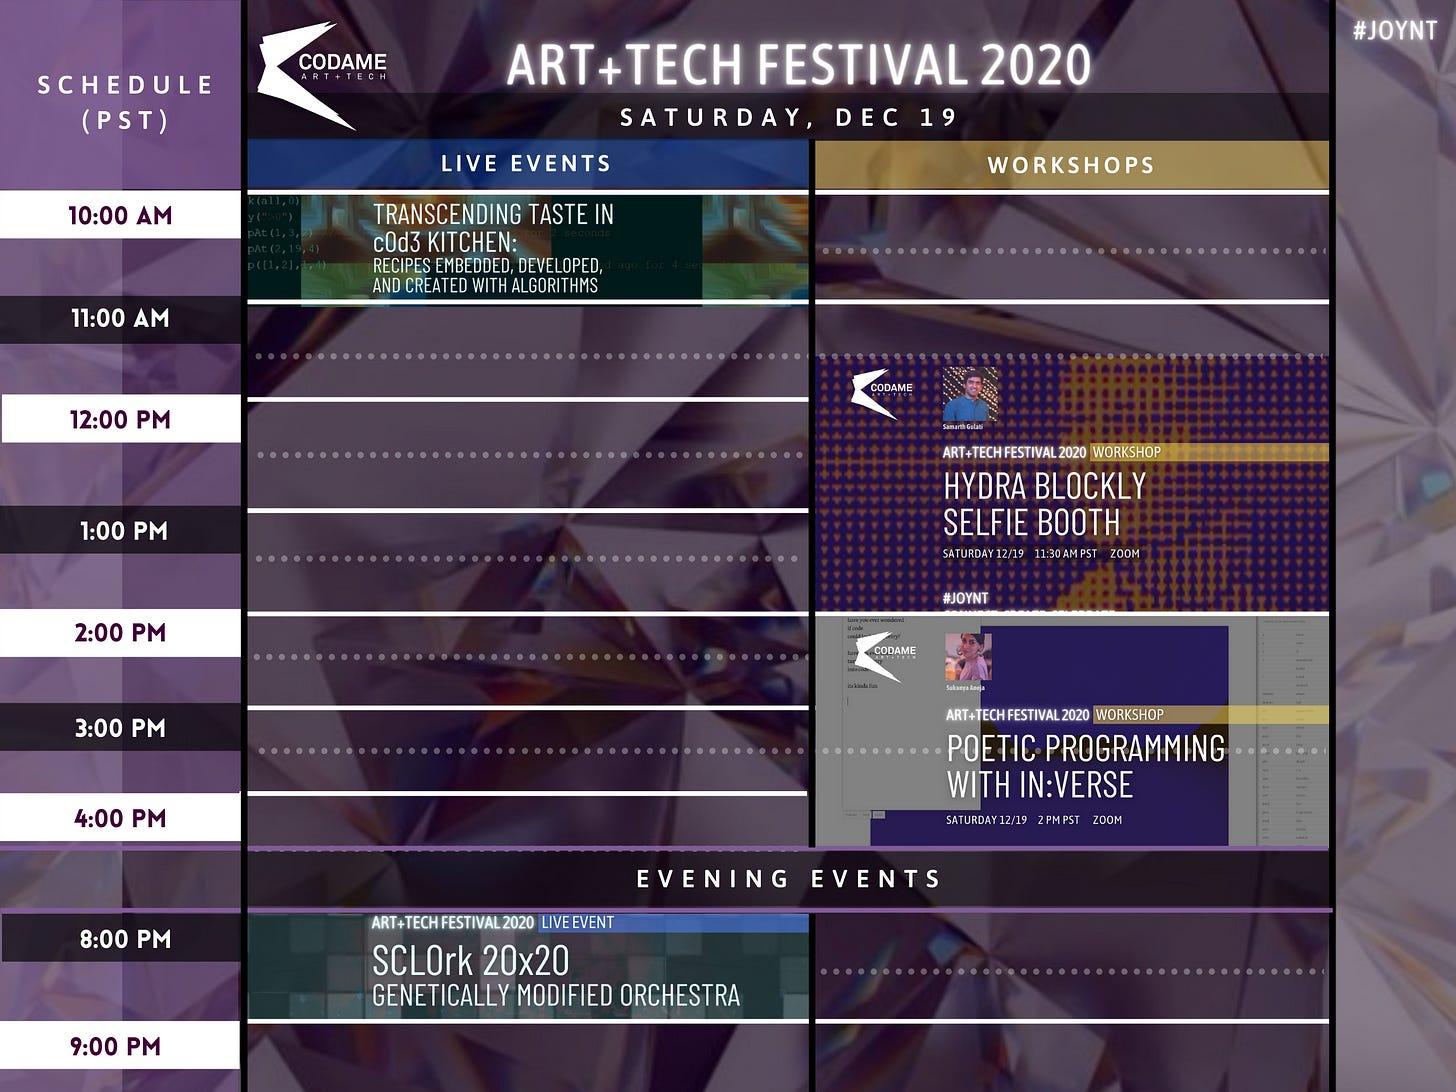 DAY 9: ART+TECH Festival 2020『 JOYNT 』